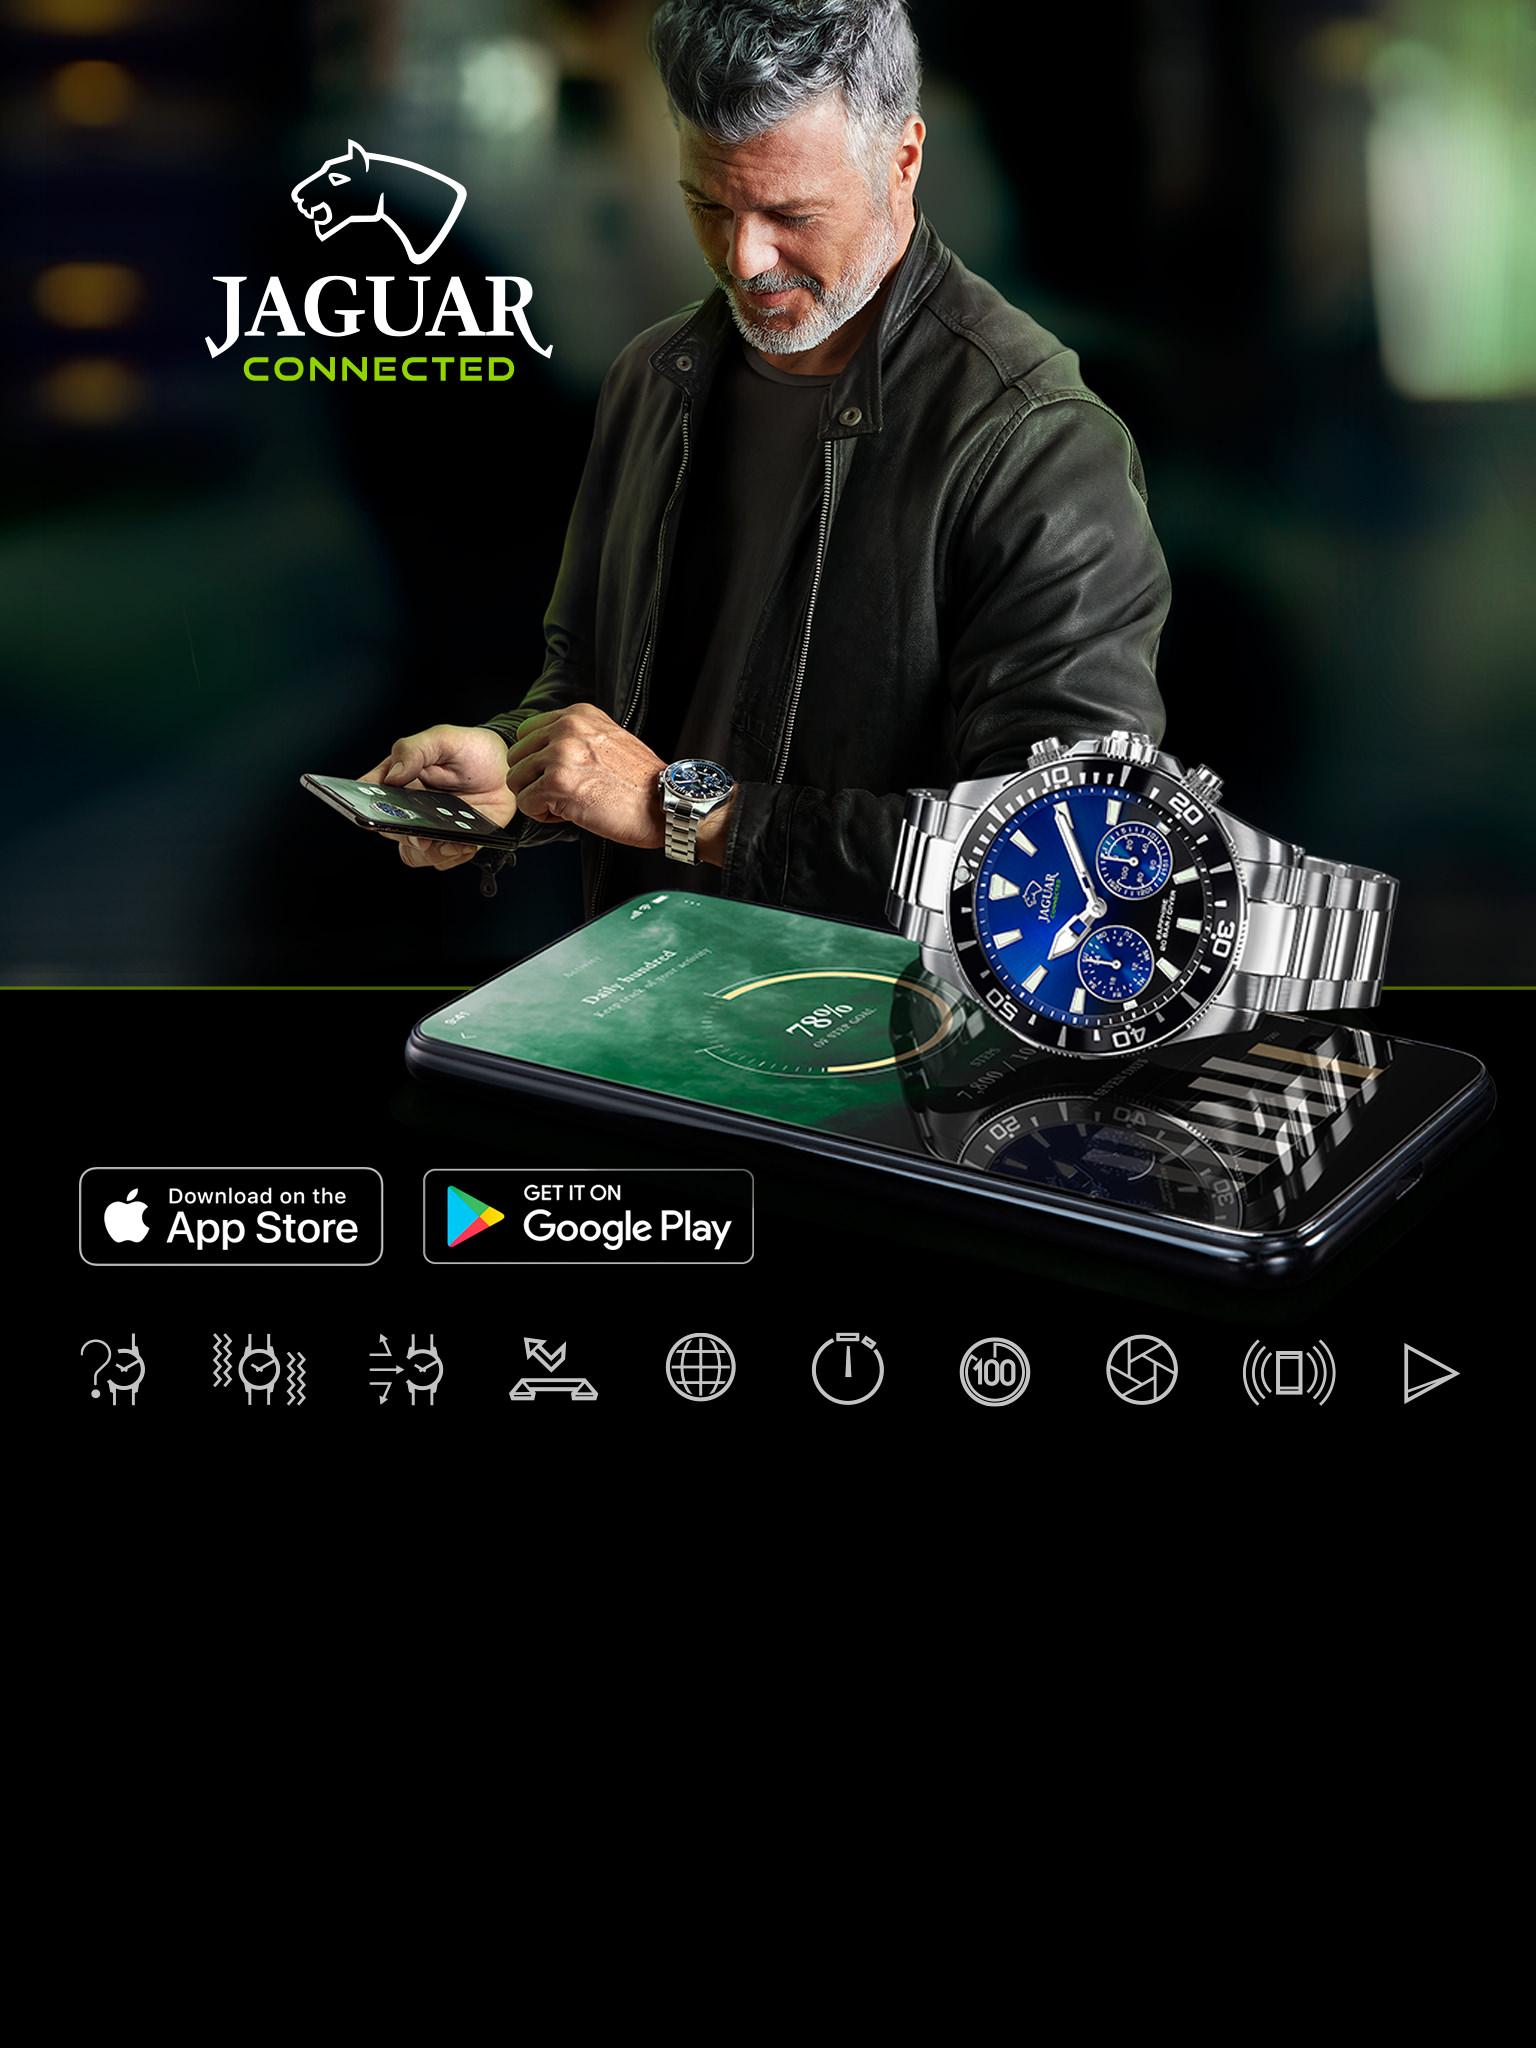 https://termekek.festina.hu/sites/default/files/revslider/image/jaguar-connected-2021-tablet.jpg